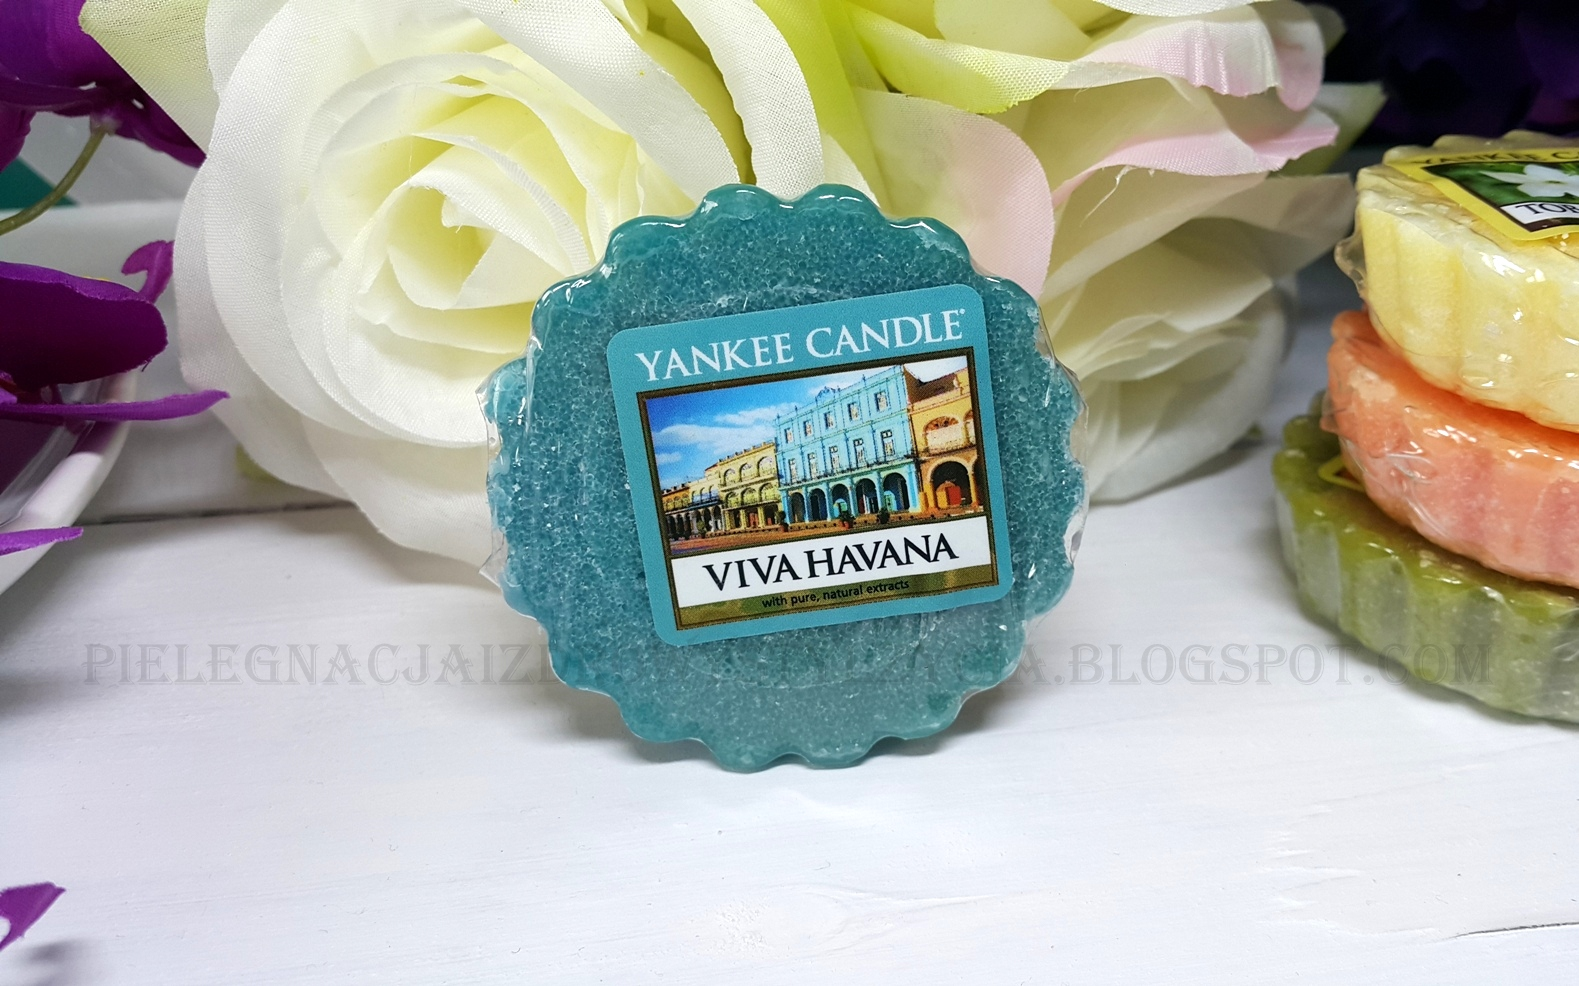 Wosk zapachowy Viva Havana Yankee Candle